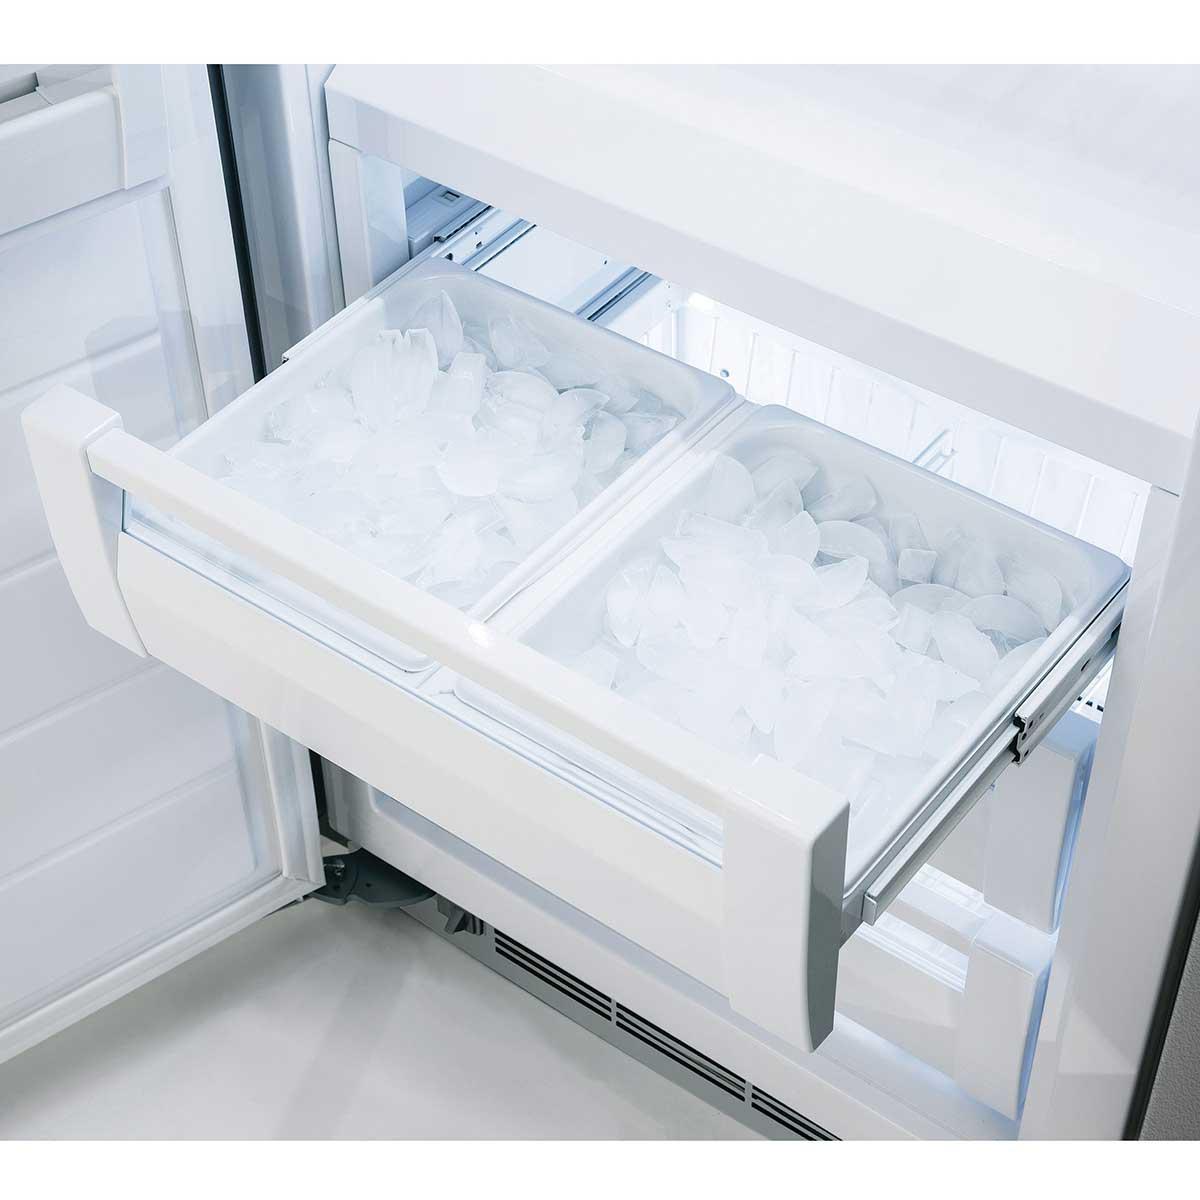 "Model: MP30FA2LS | Marvel  Marvel Professional Built-In 30"" All Freezer- Solid Stainless Steel Door  Left Hinge, Slim Designer Handle"